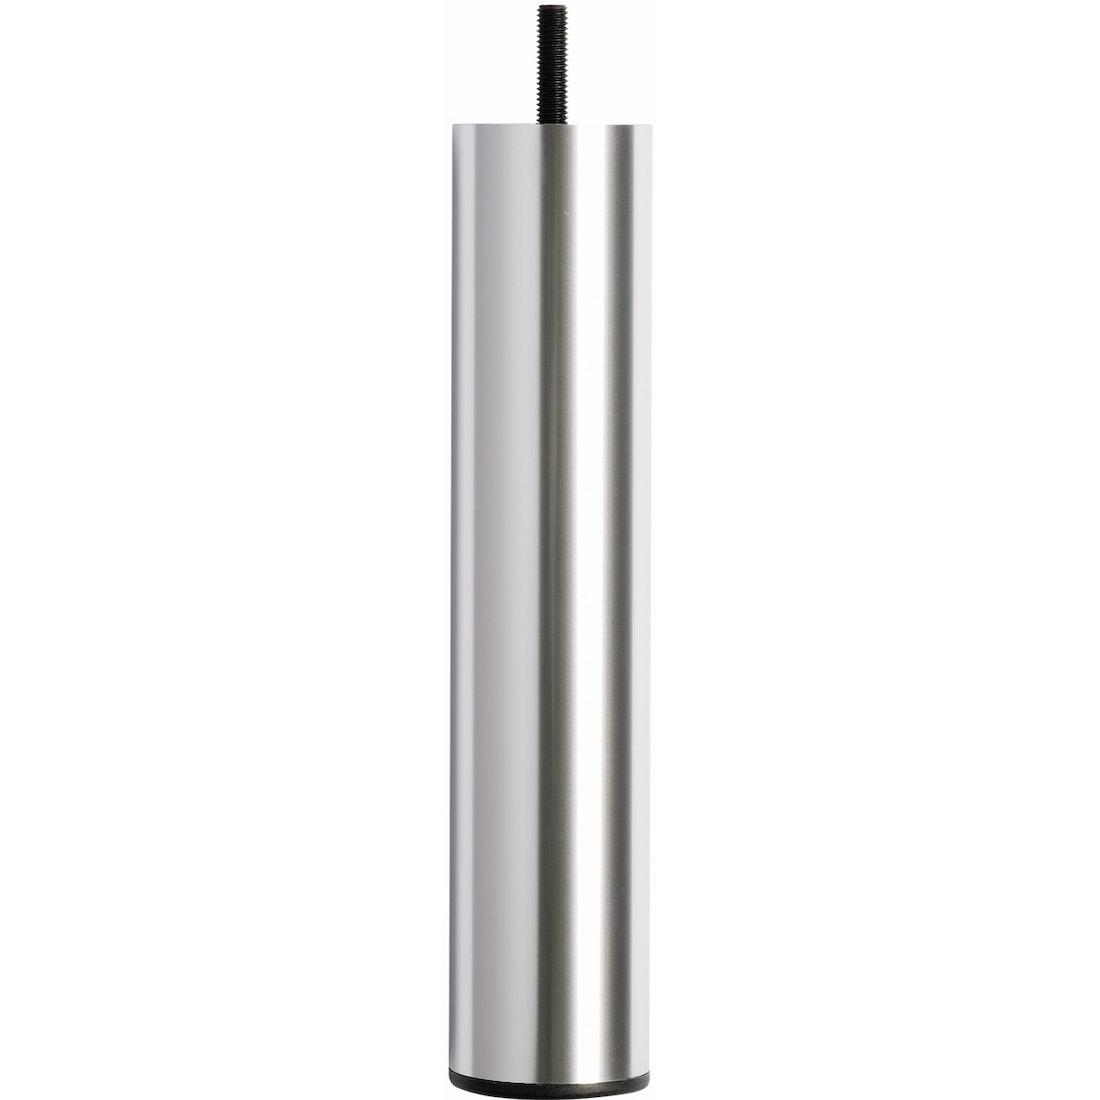 DUX Senge DUX Sengeben - Aluminium (2-pak), Timm Møbler